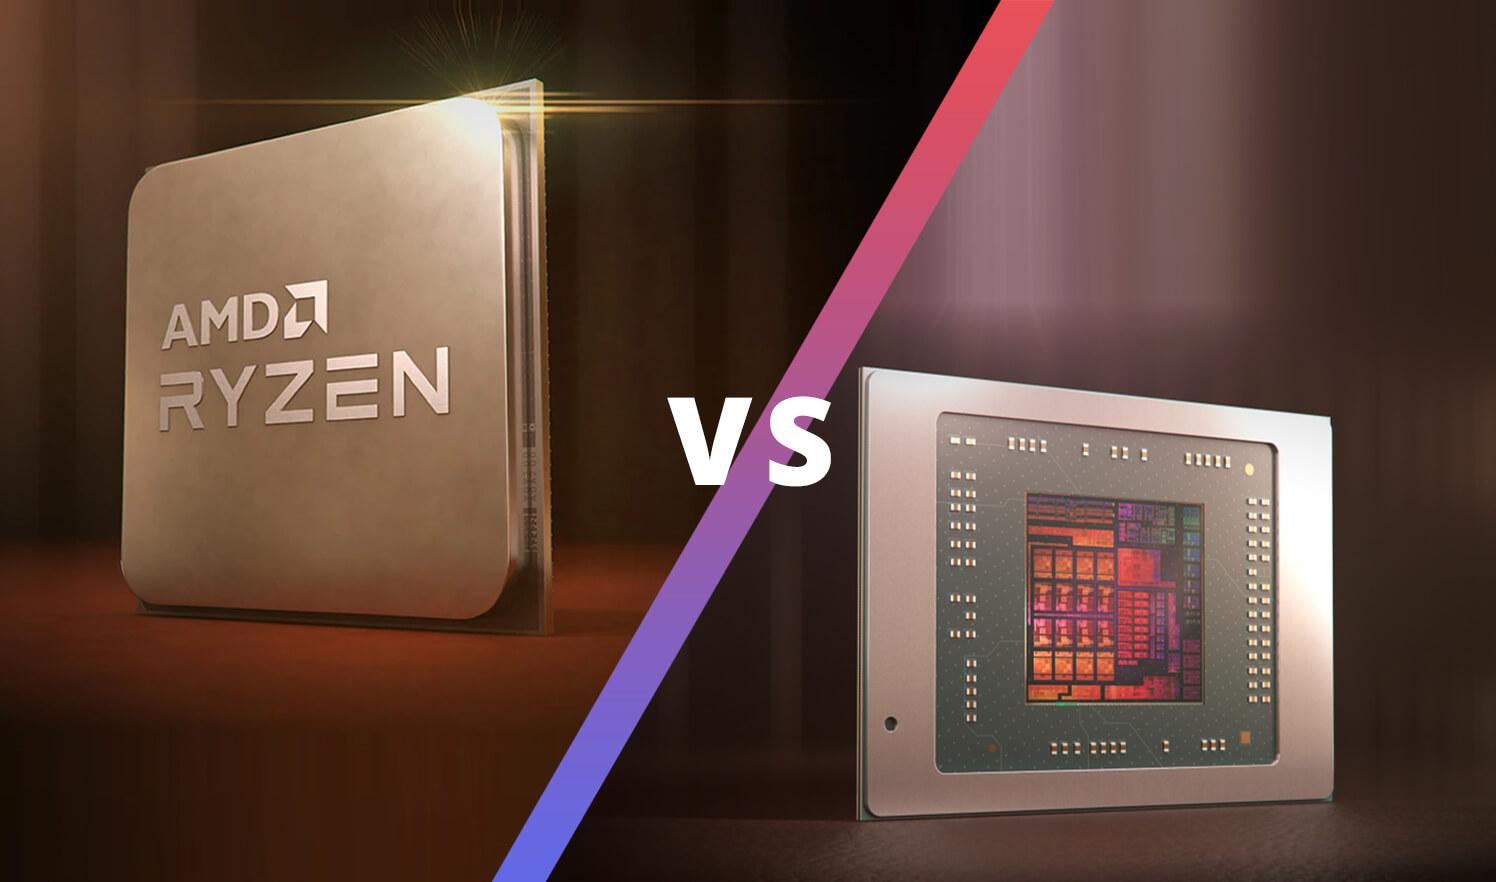 Desktop CPUs vs Mobile CPUs: Differences and Similarities